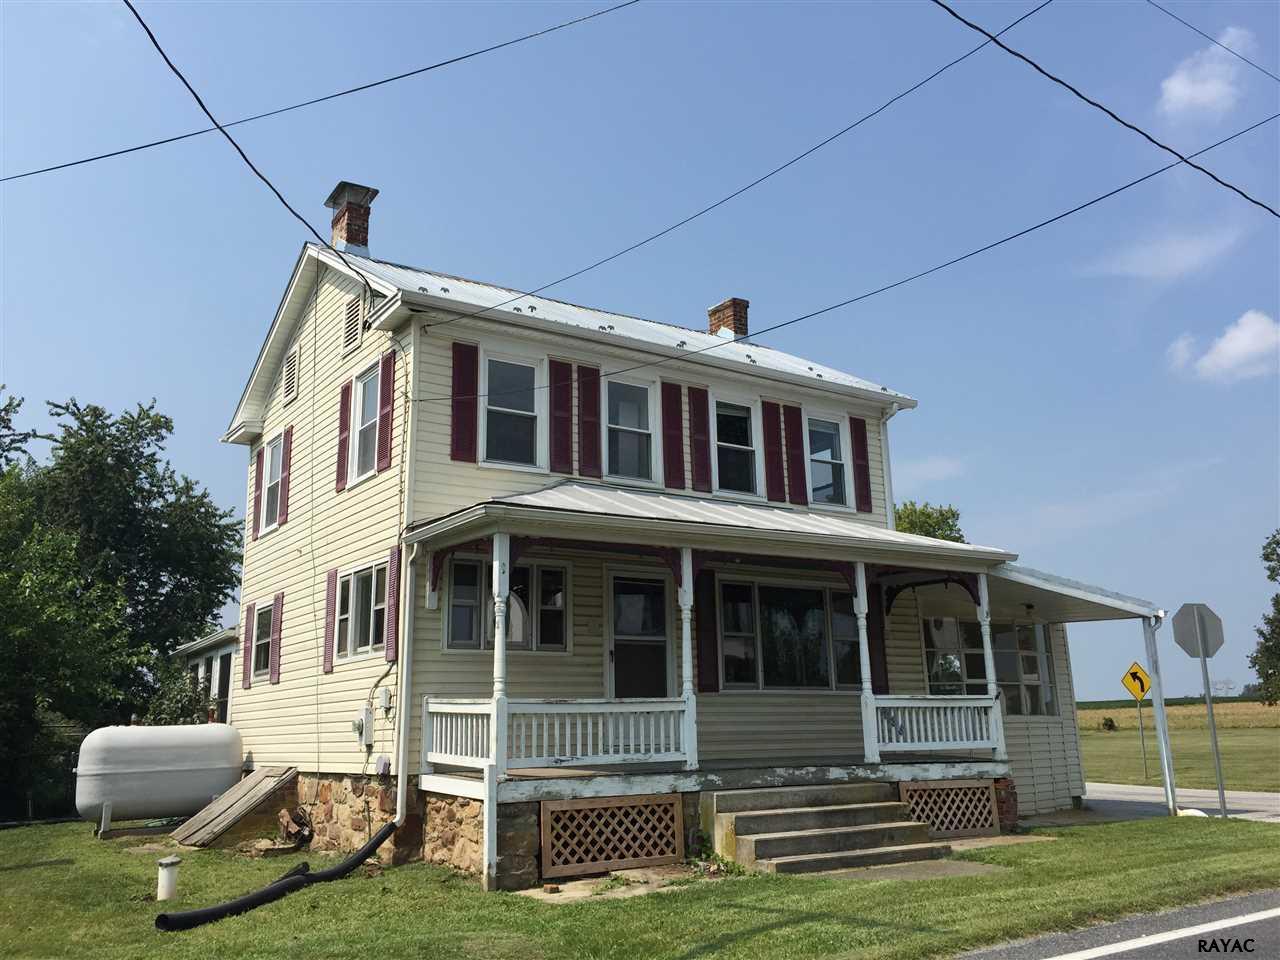 Real Estate for Sale, ListingId: 36391635, Littlestown,PA17340